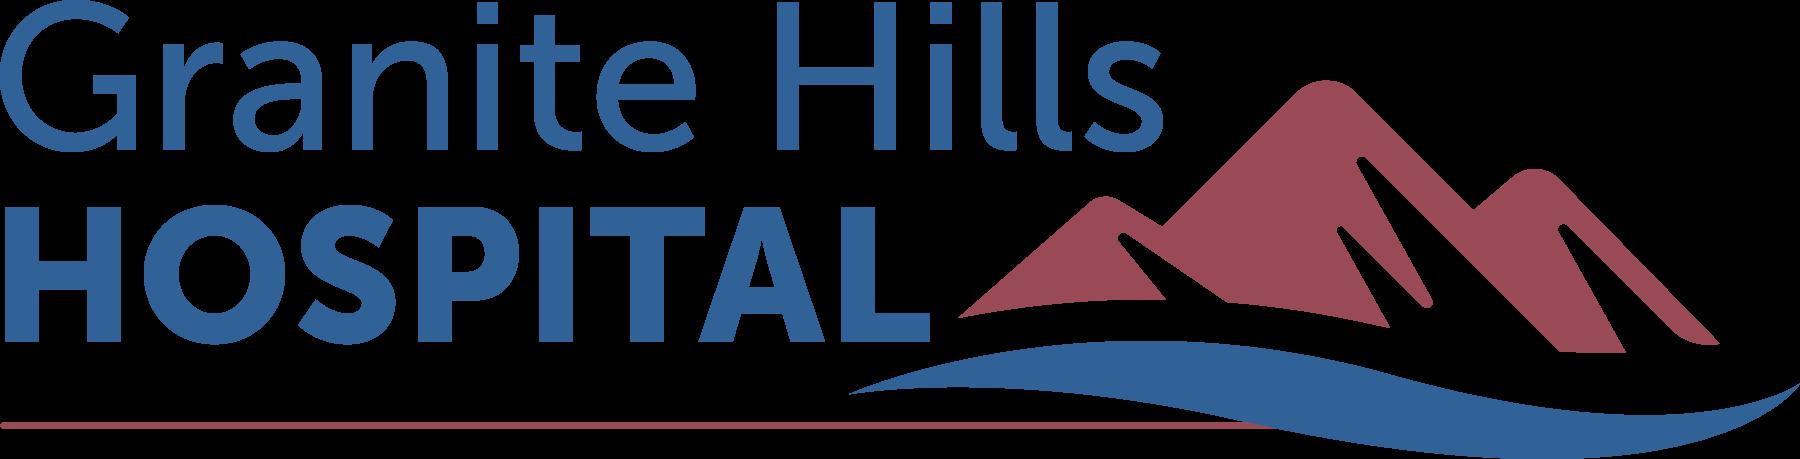 Granite Hills Hospital